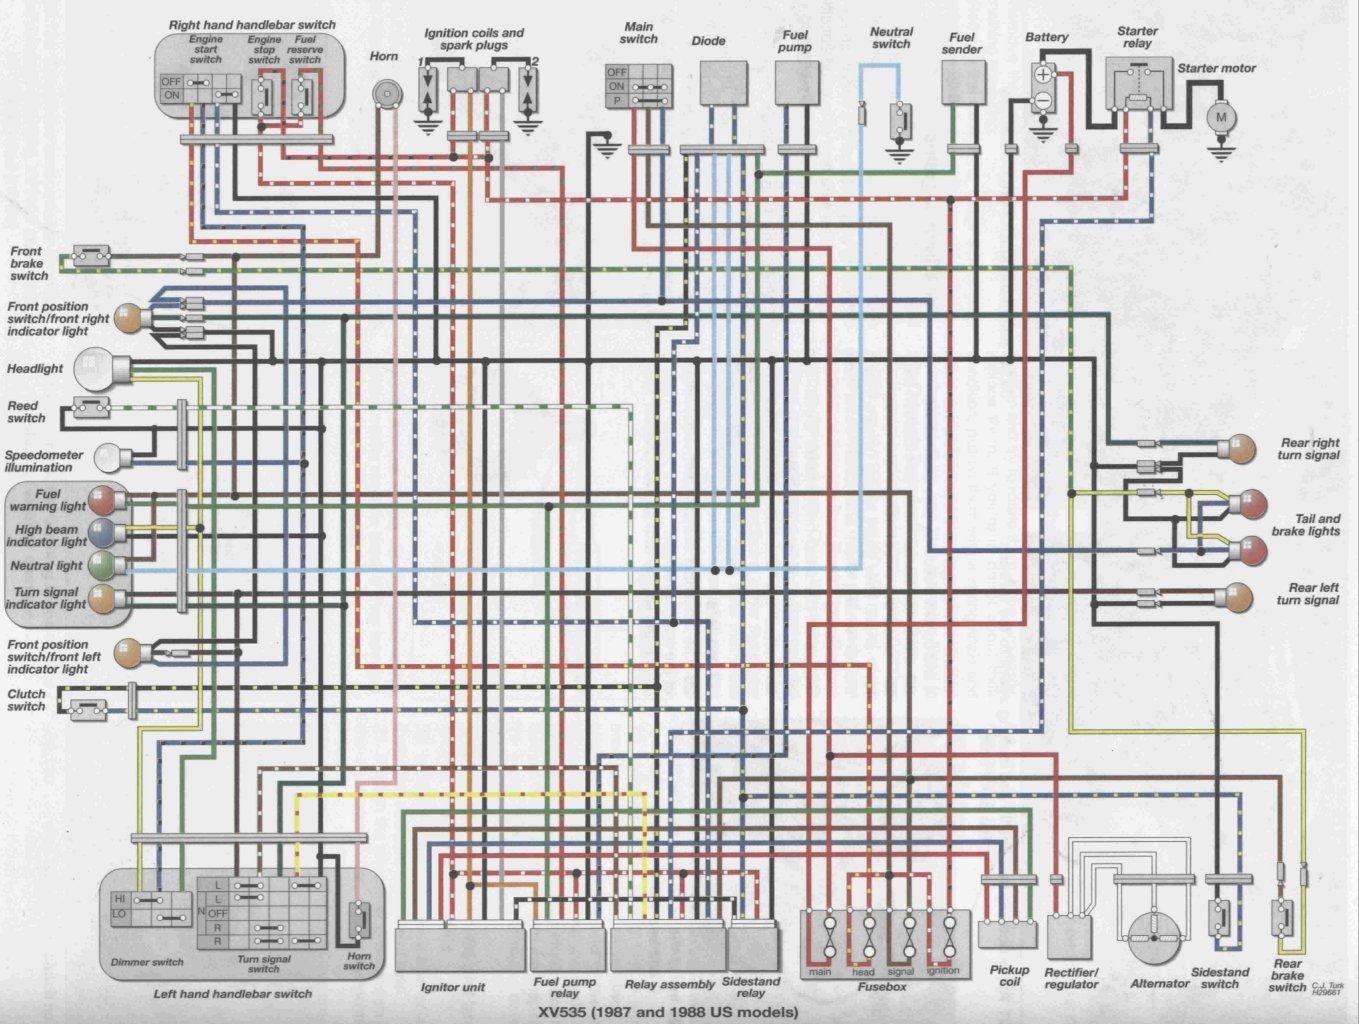 small resolution of 1984 honda vt500c wiring diagram color wiring diagrams data base rh alfrescosolutions co 1984 honda shadow